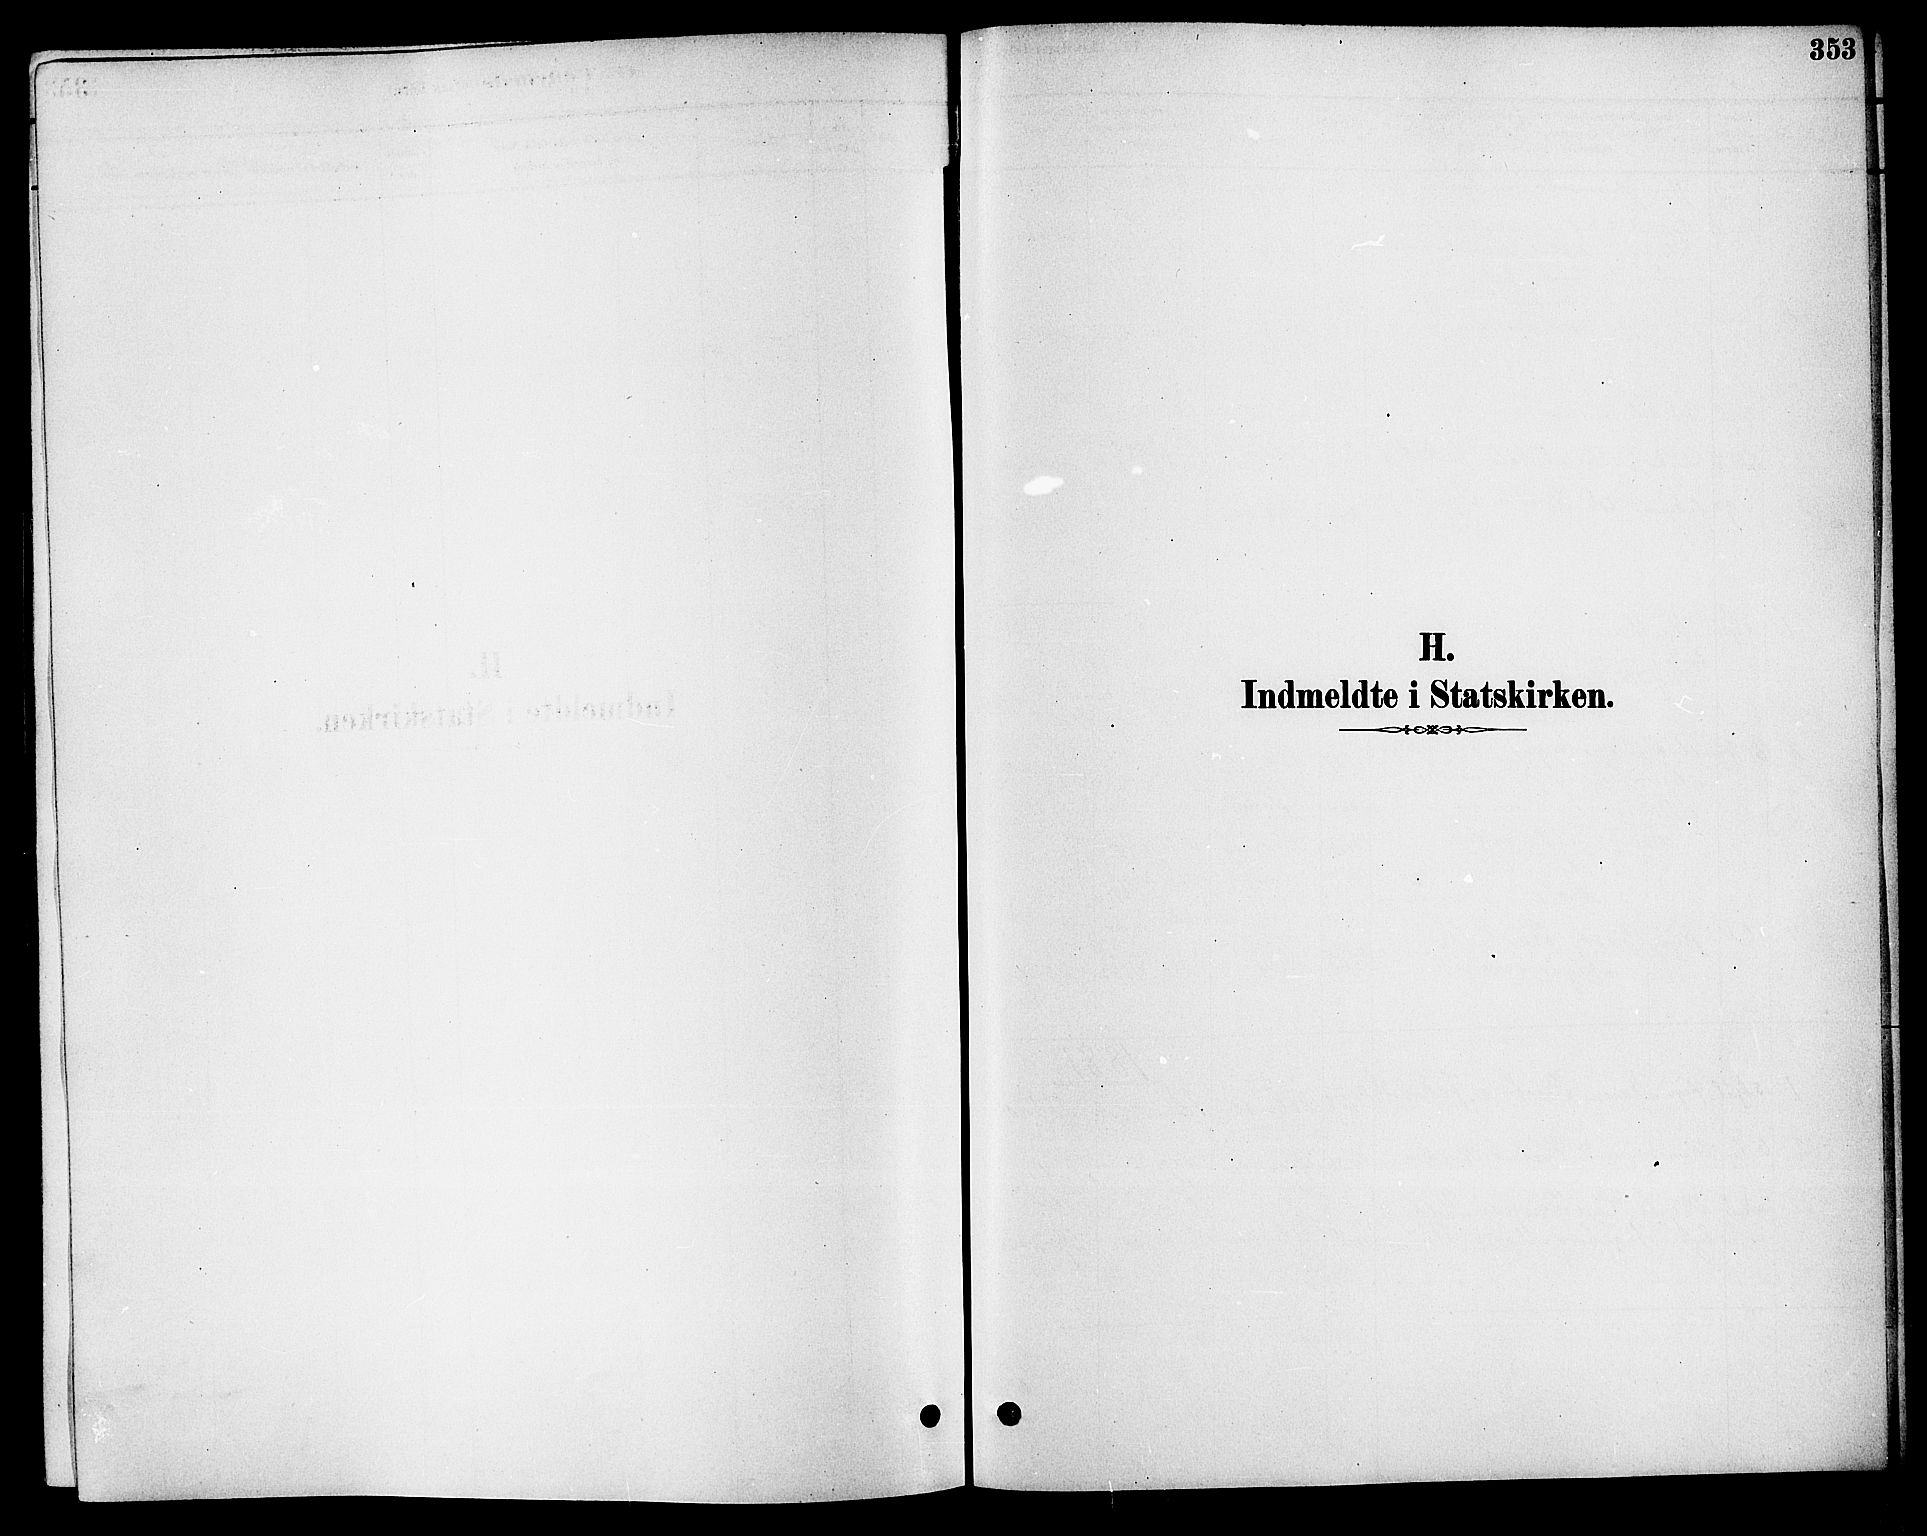 SAKO, Solum kirkebøker, F/Fa/L0009: Ministerialbok nr. I 9, 1877-1887, s. 353